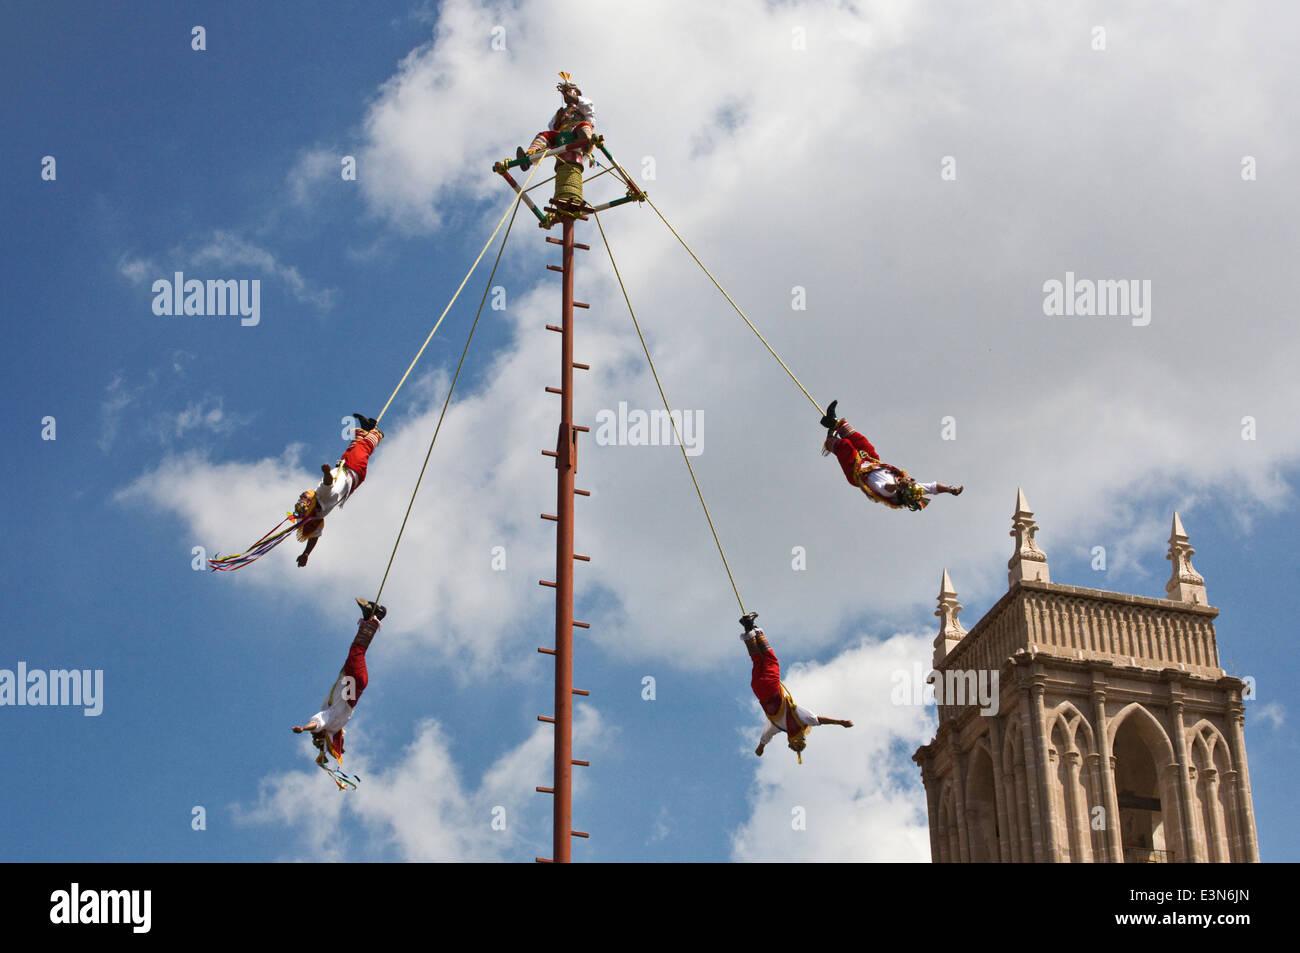 The EL TAJIN SKY DANCERS from VERACRUZ perform during the INDEPENDENCE DAY FESTIVITIES - SAN MIGUEL DE ALLENDE, - Stock Image